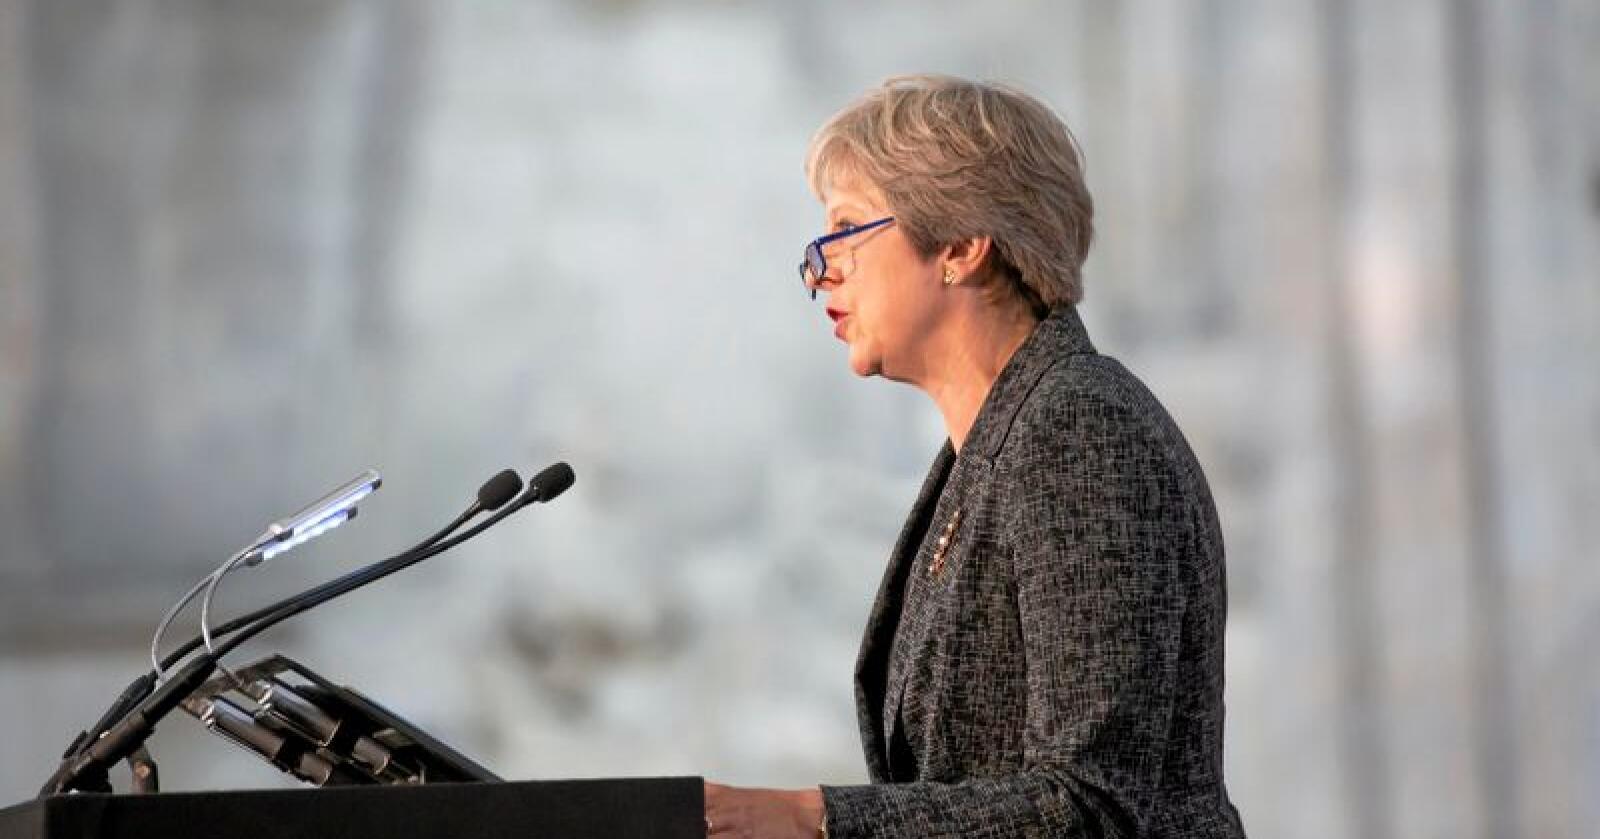 Statsminister Theresa May må belage seg på tøffe politiske slag også denne høsten. Foto: Sebastien Courdji / AP / NTB Scanpix